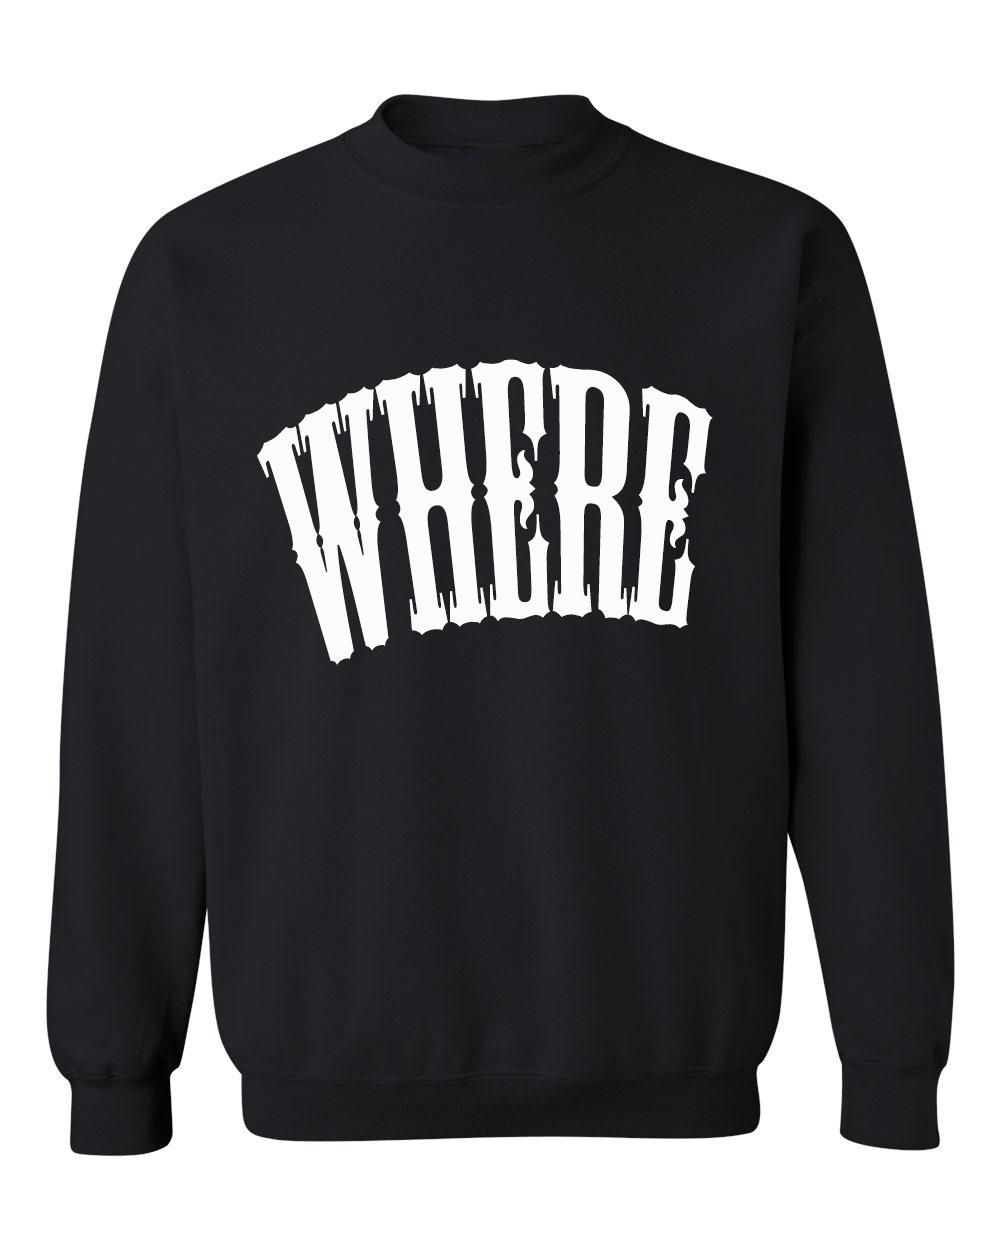 Where to buy crew neck sweaters